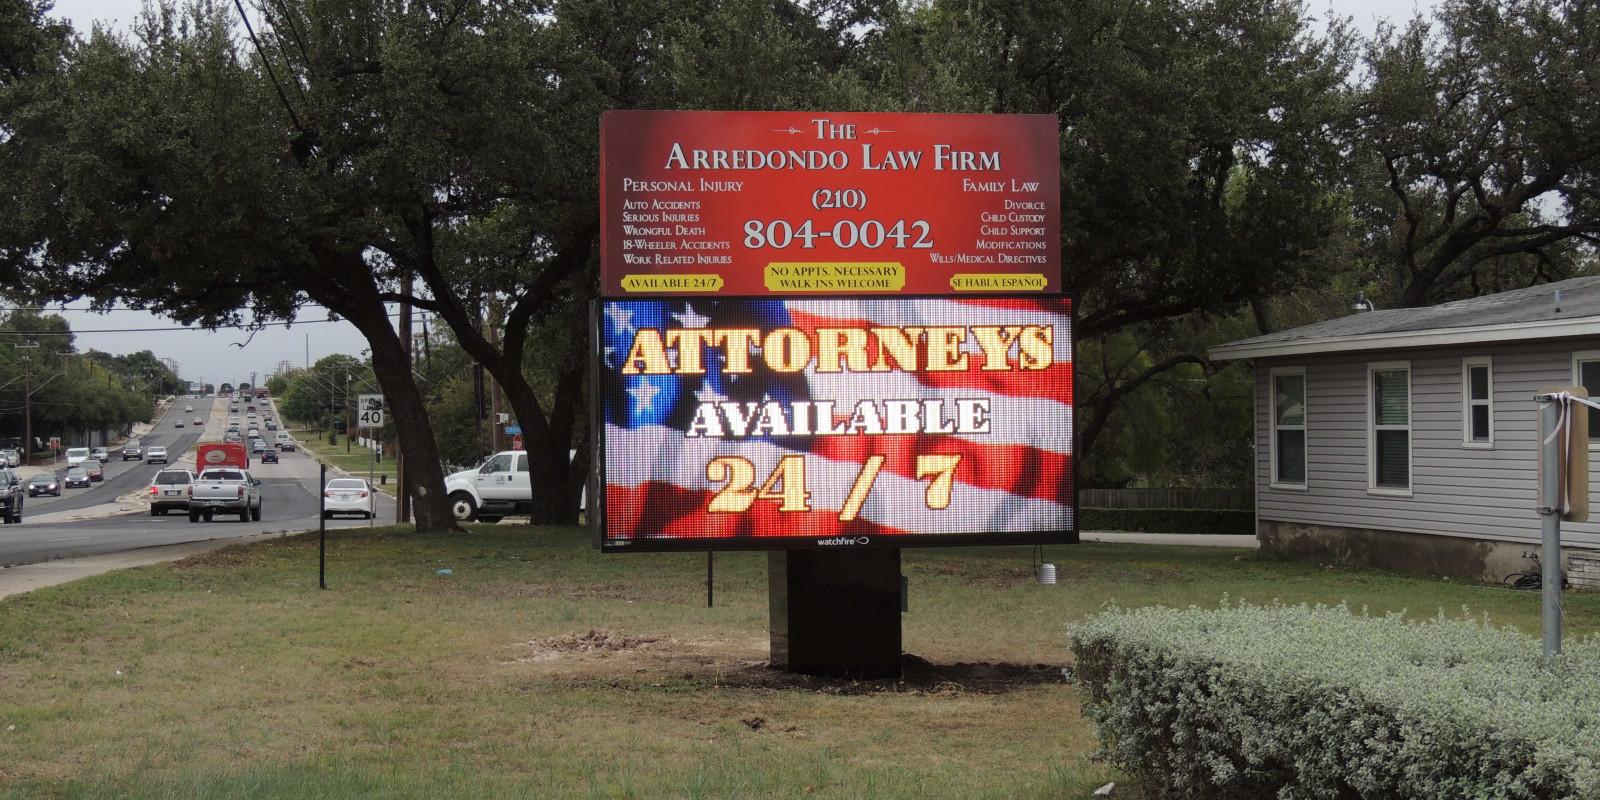 Arredondo Law Firm - San Antonio, Texas